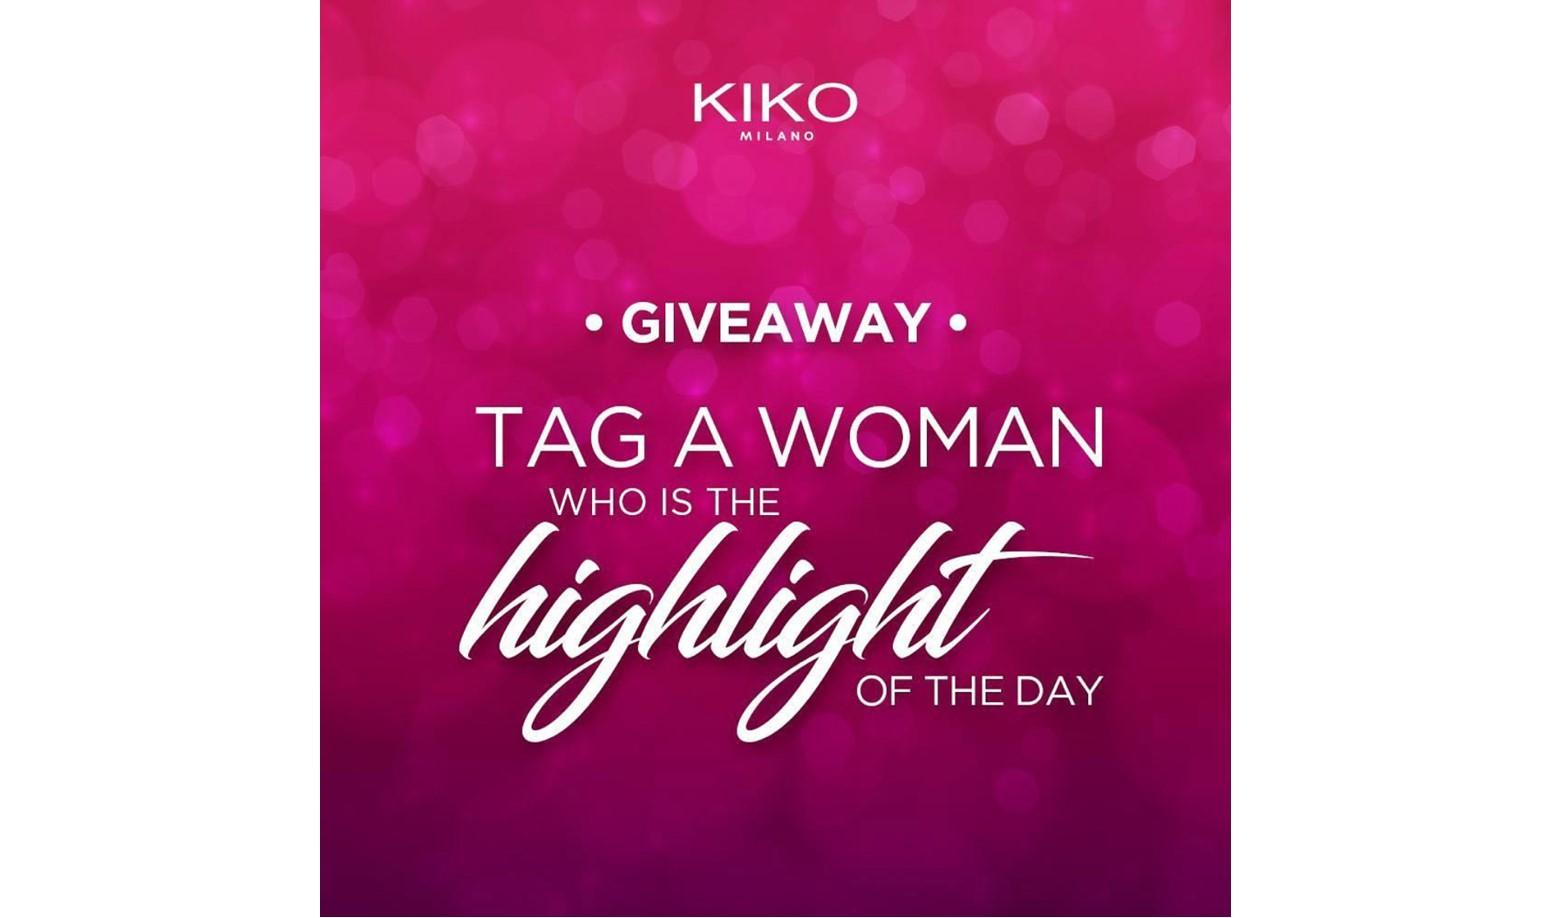 Kiko competition